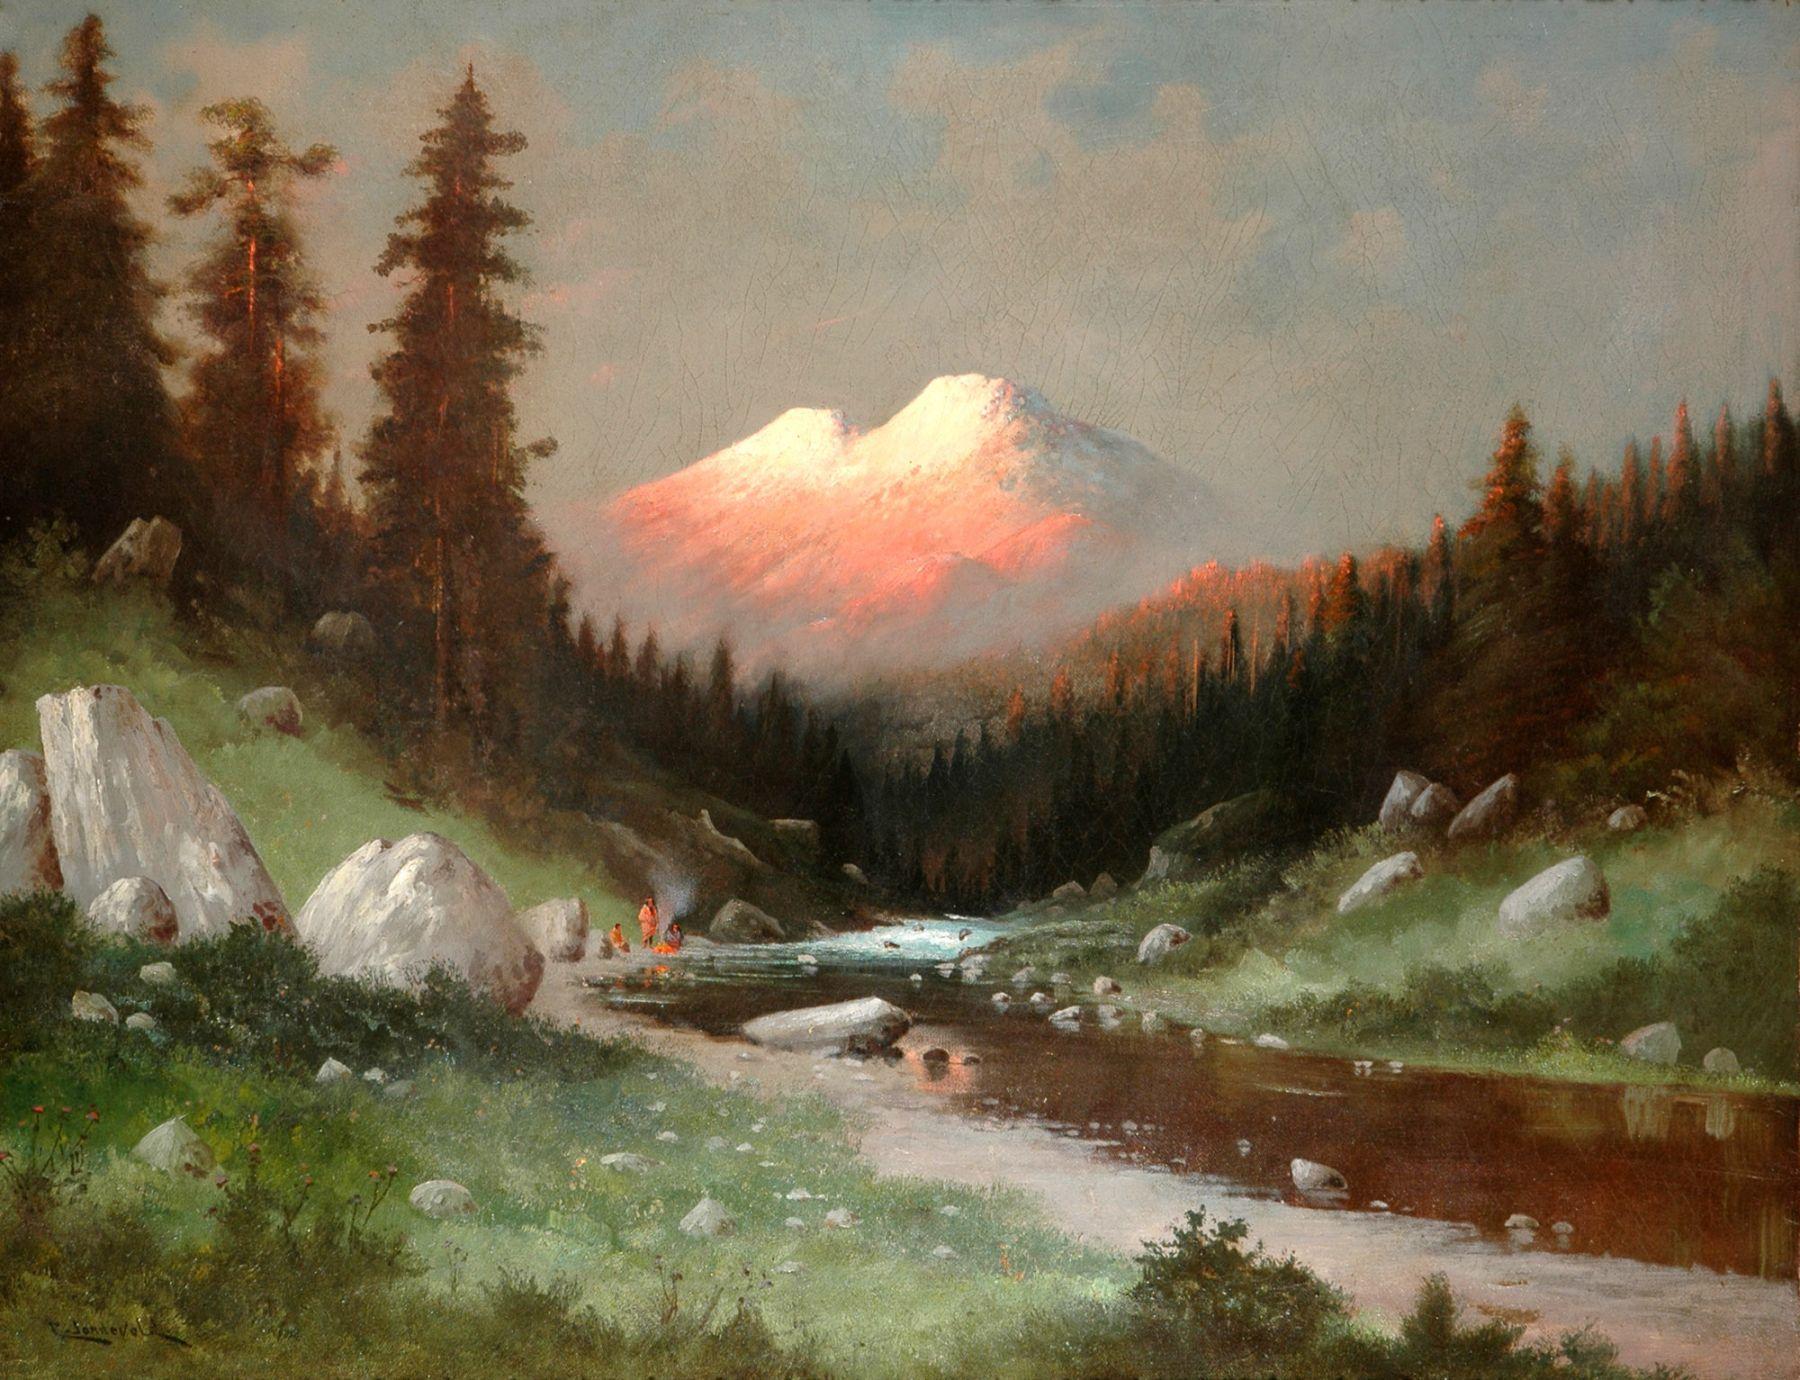 CARL HENRIK JONNEVOLD (1856-1955), Indian Encampment Along Sacramento River Viewing Mt Shasta & Shastina, c. late 1880s